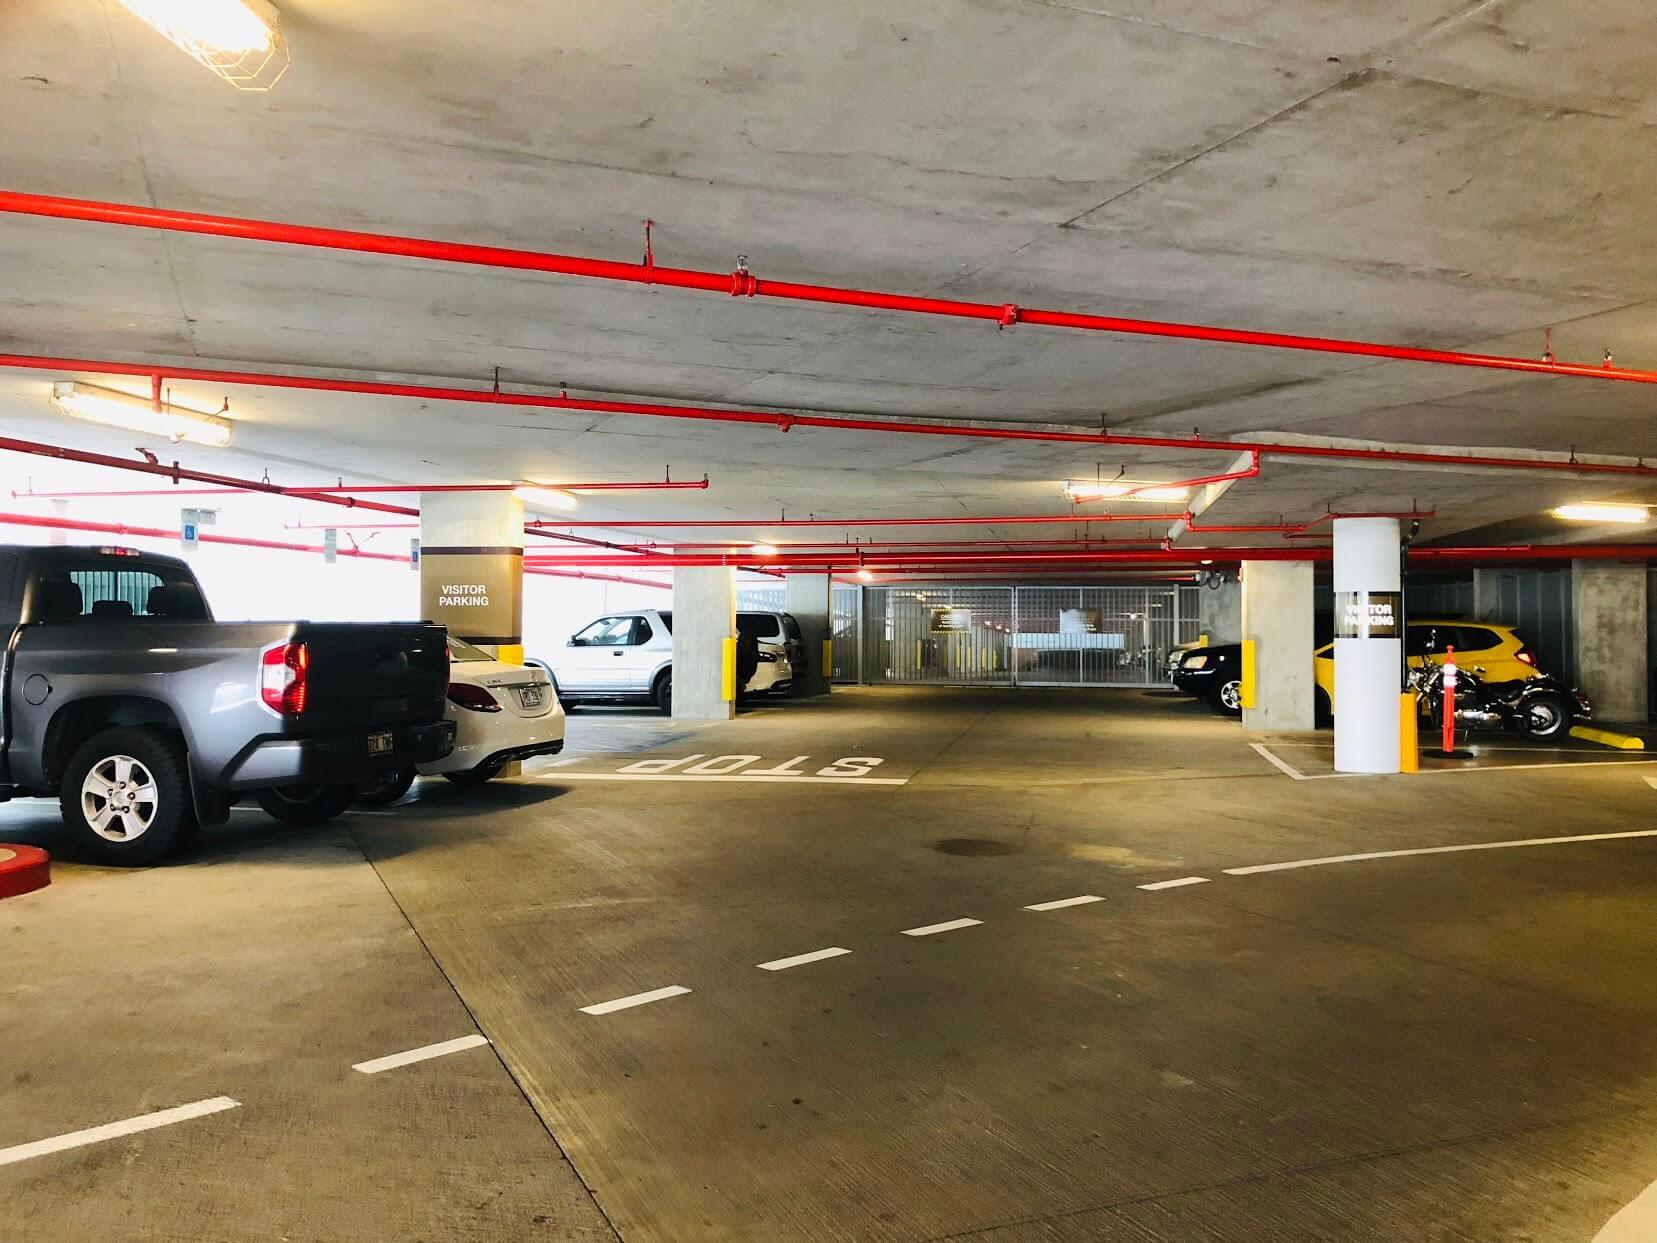 Waihonua at Kewaloの駐車場